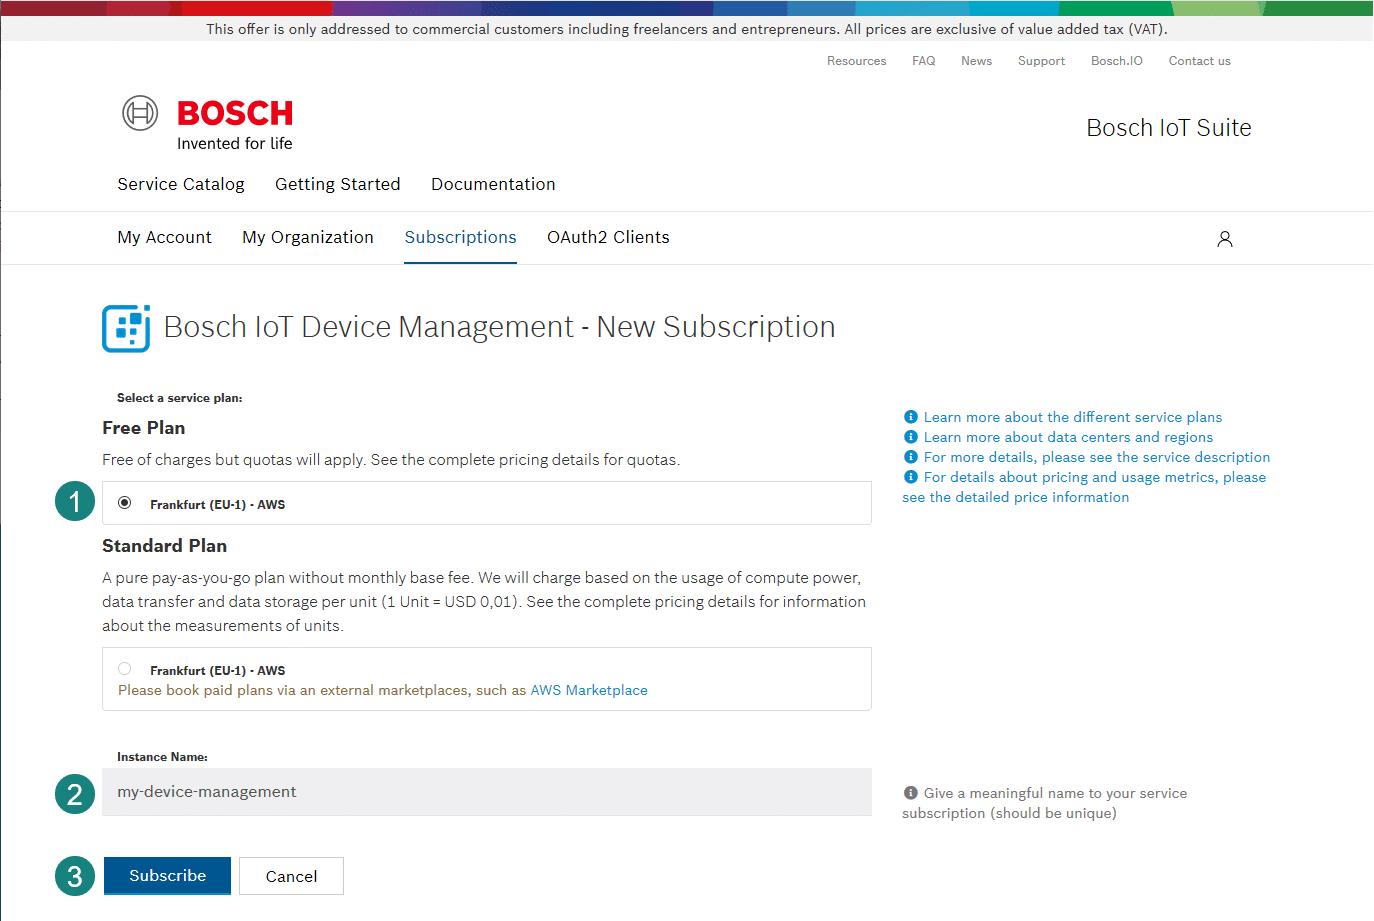 set-service-name